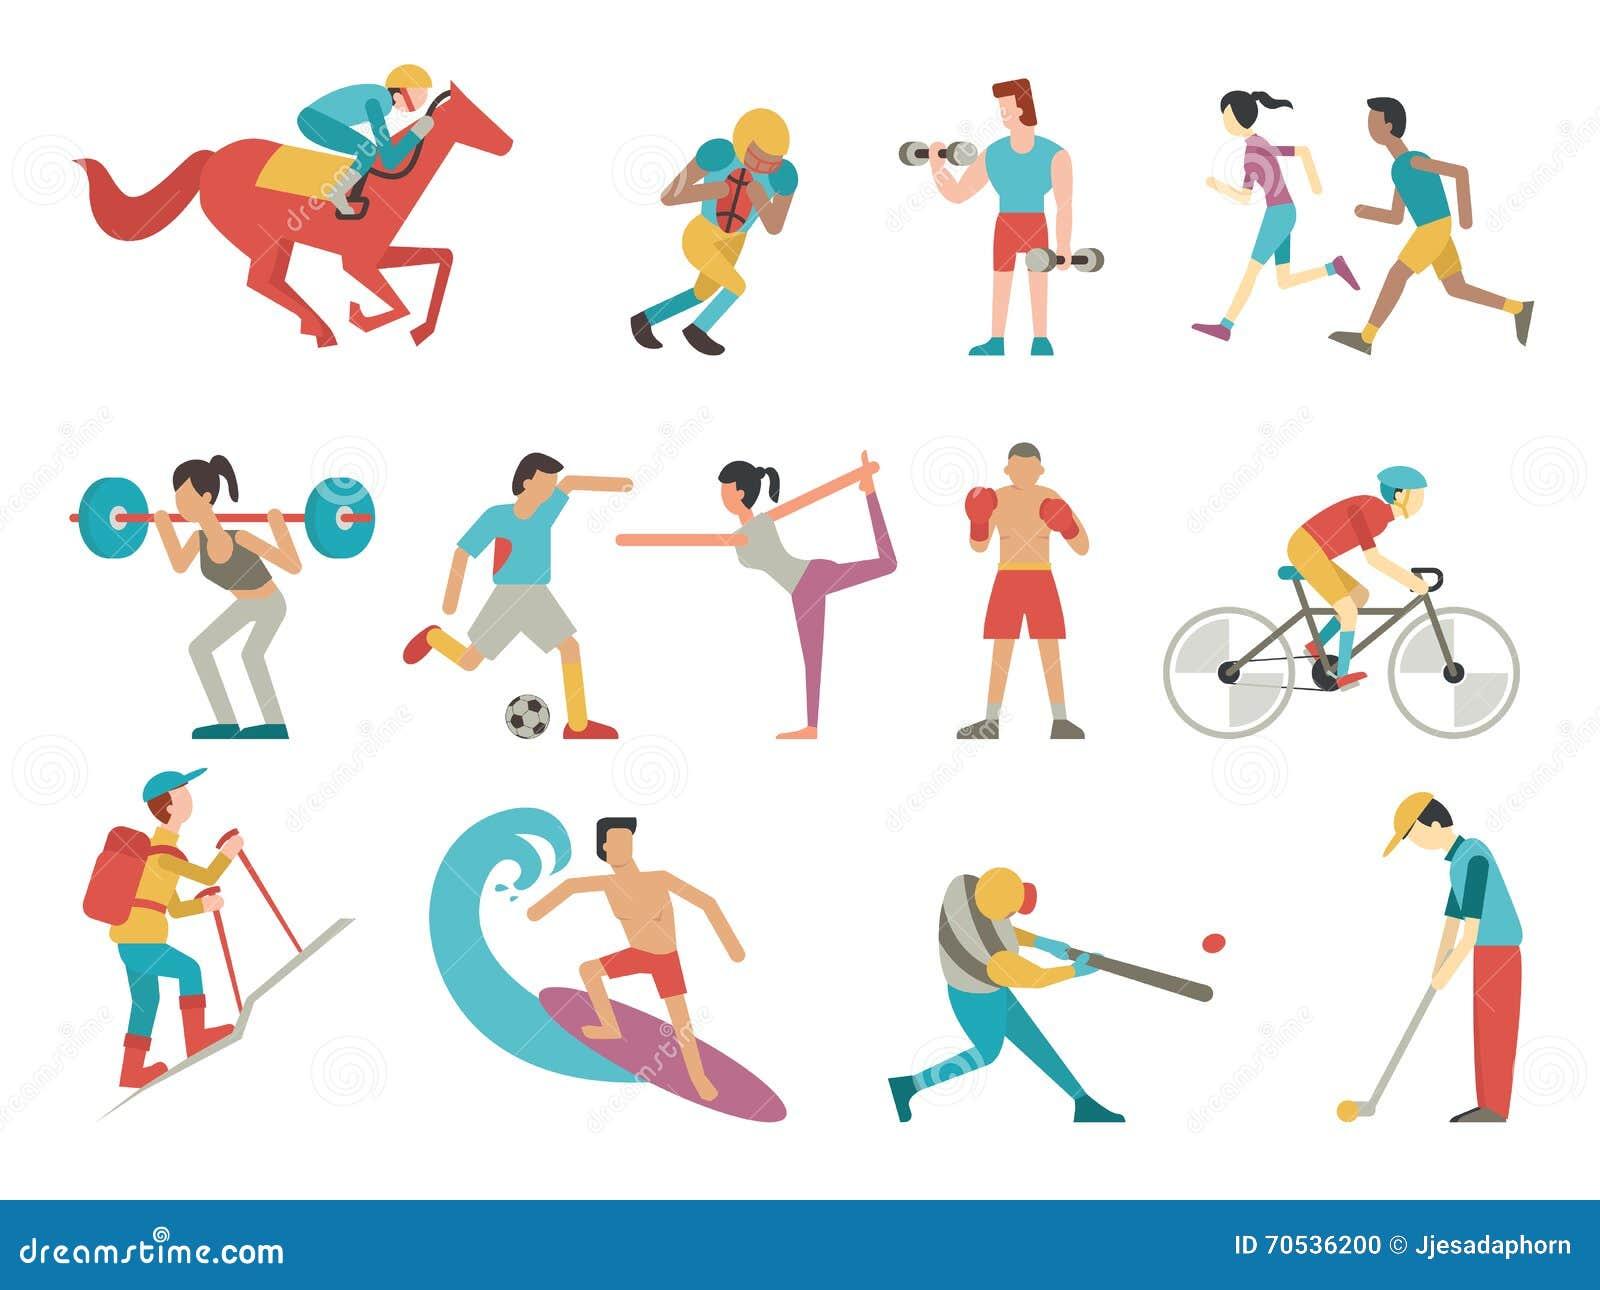 Vector Character Design Illustrator : Sport people set stock vector illustration of american